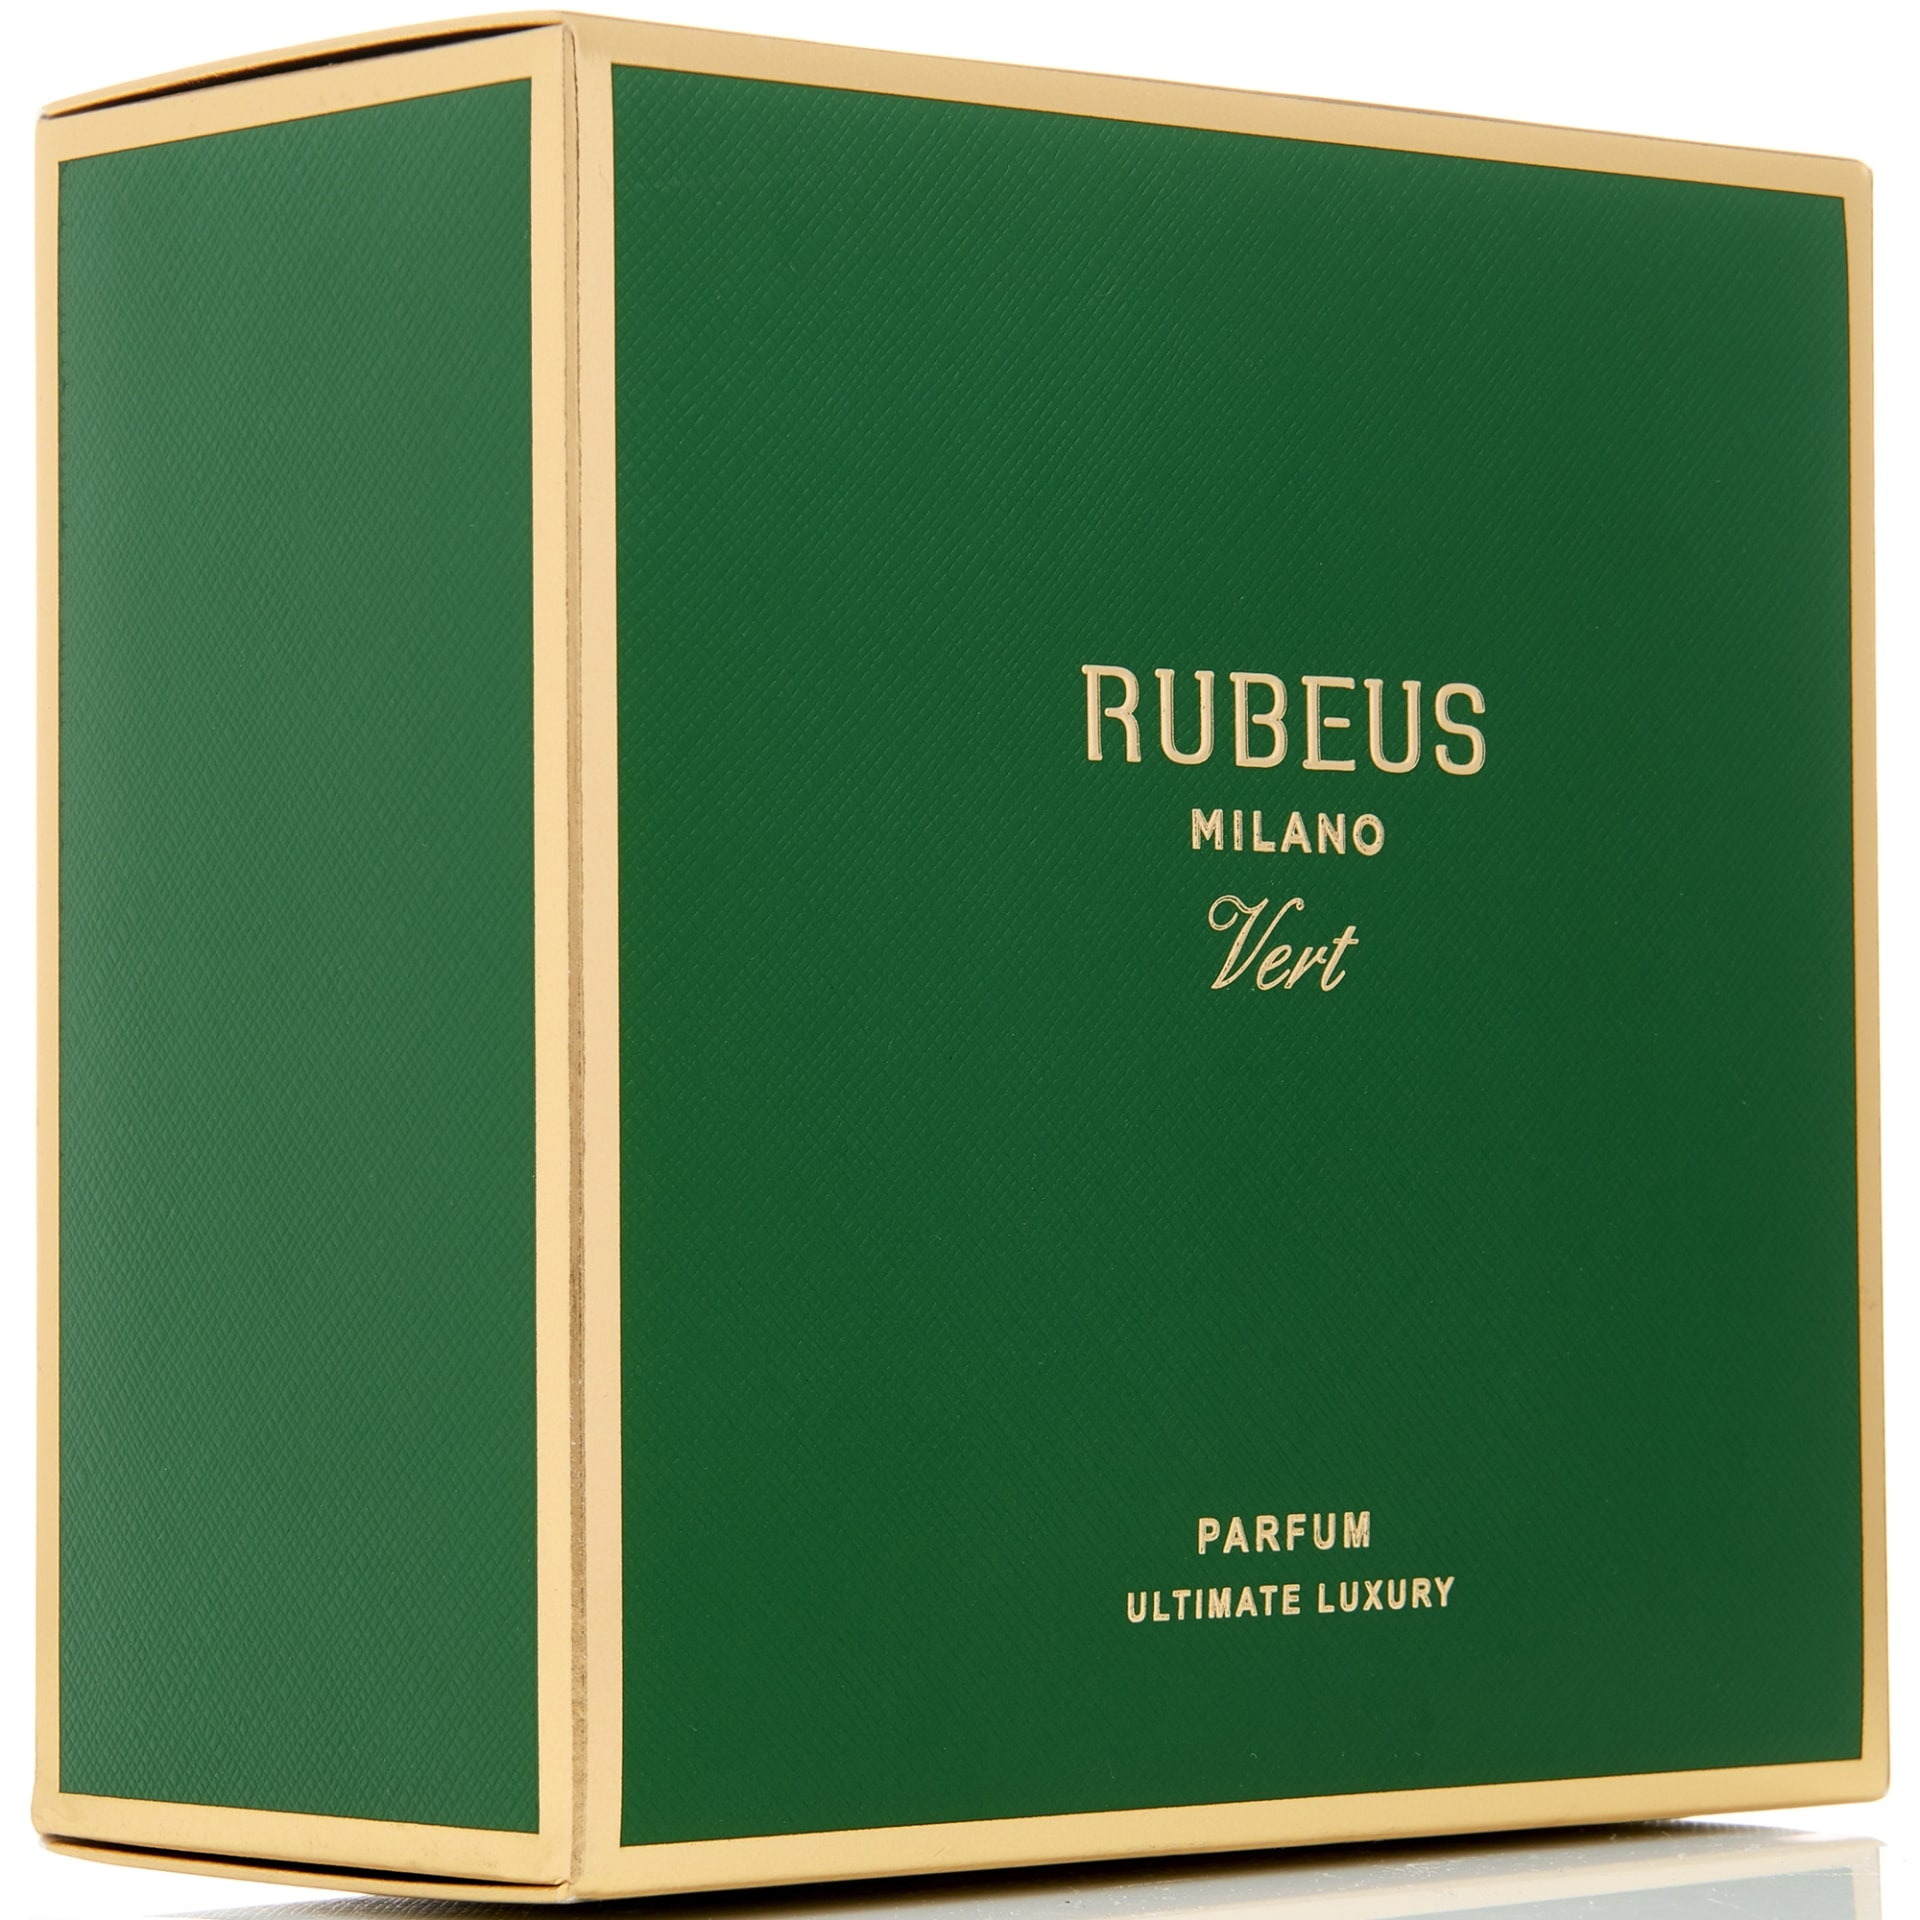 rubeus-milano-vert-5